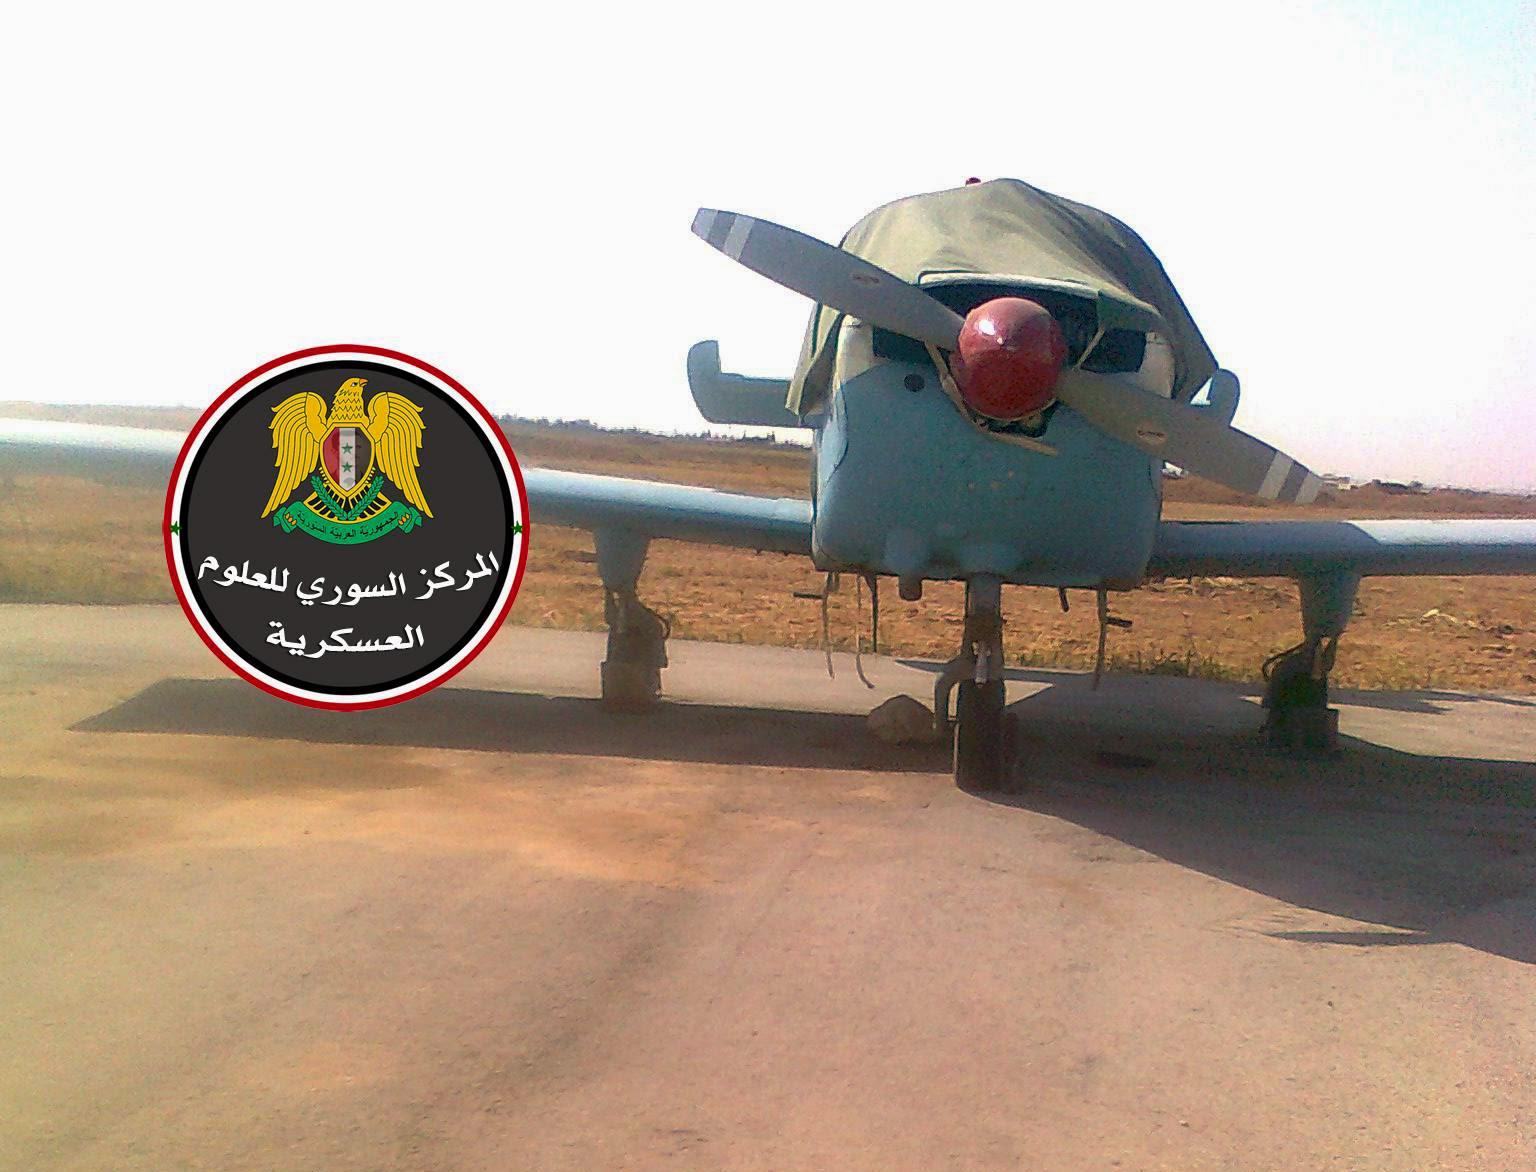 Сохранившийся MBB-223 Flamingo на одном из сирийских аэродромов